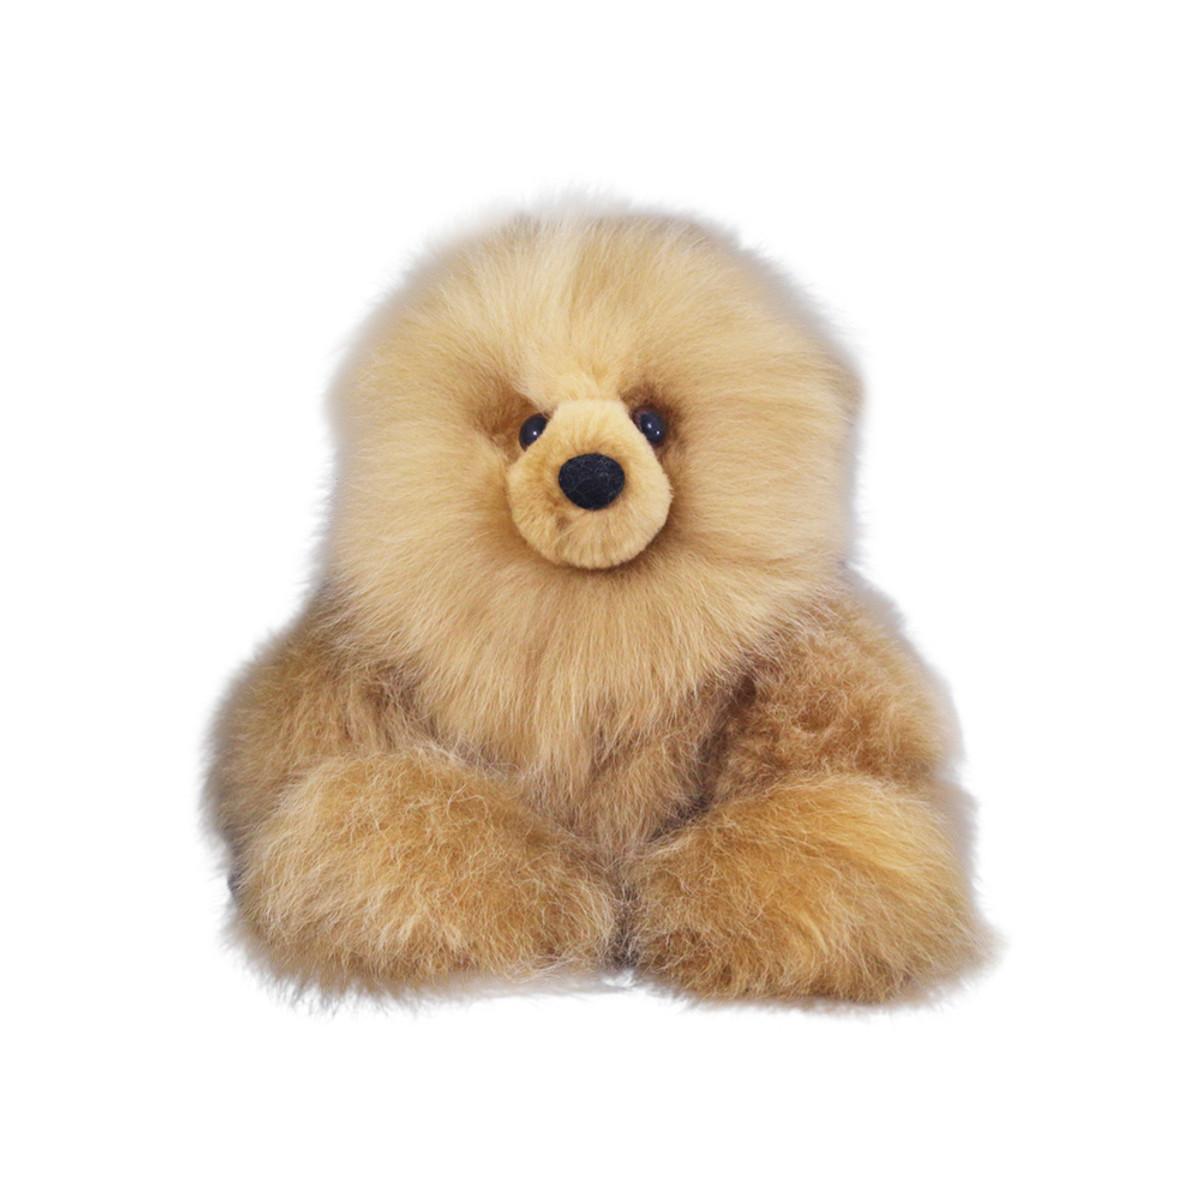 Superfine 100 Baby Alpaca Fur Stuffed Artist Teddy Bear 11 22b